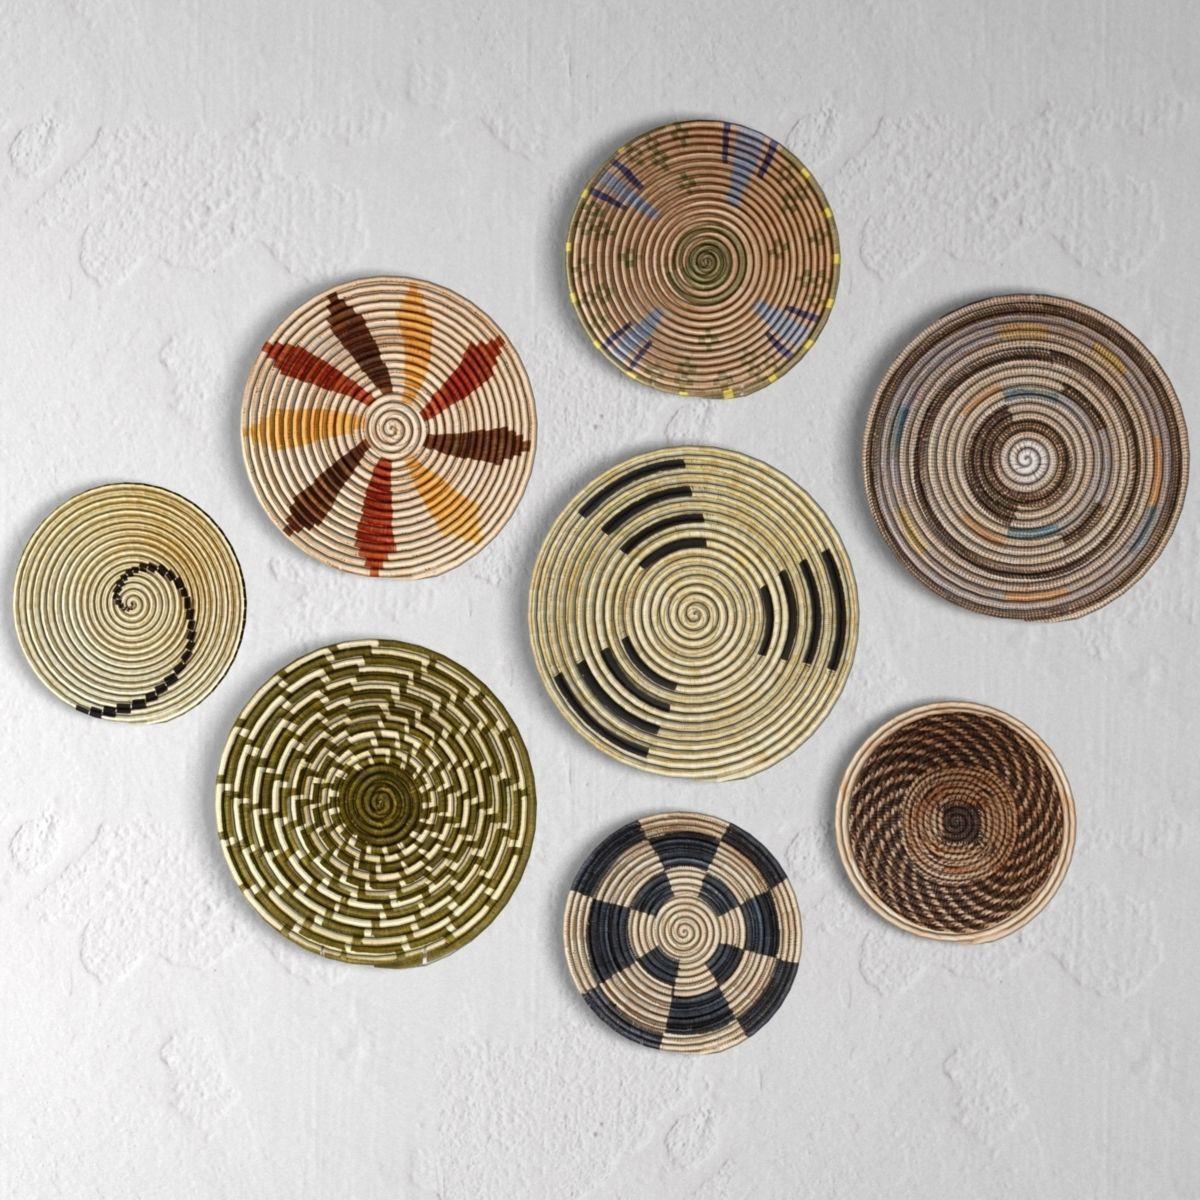 Set Wicker African Wall Baskets 3d Cgtrader